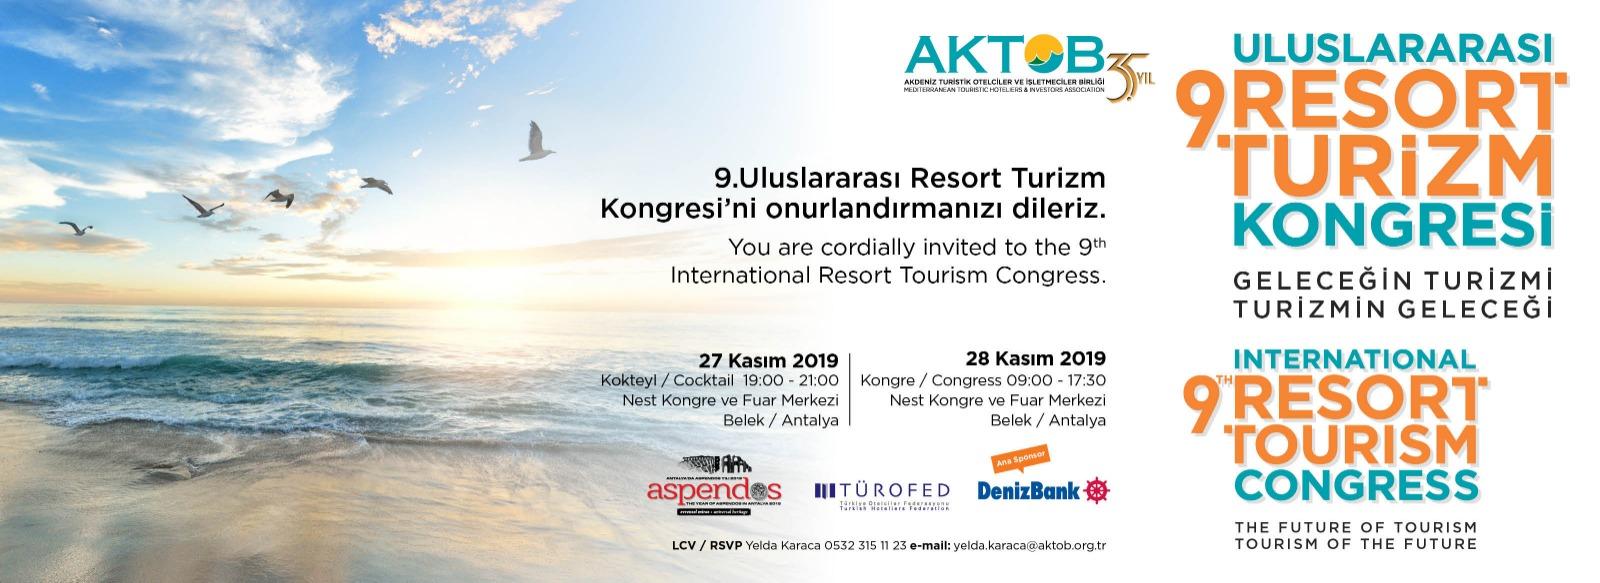 Turizm Kongresi